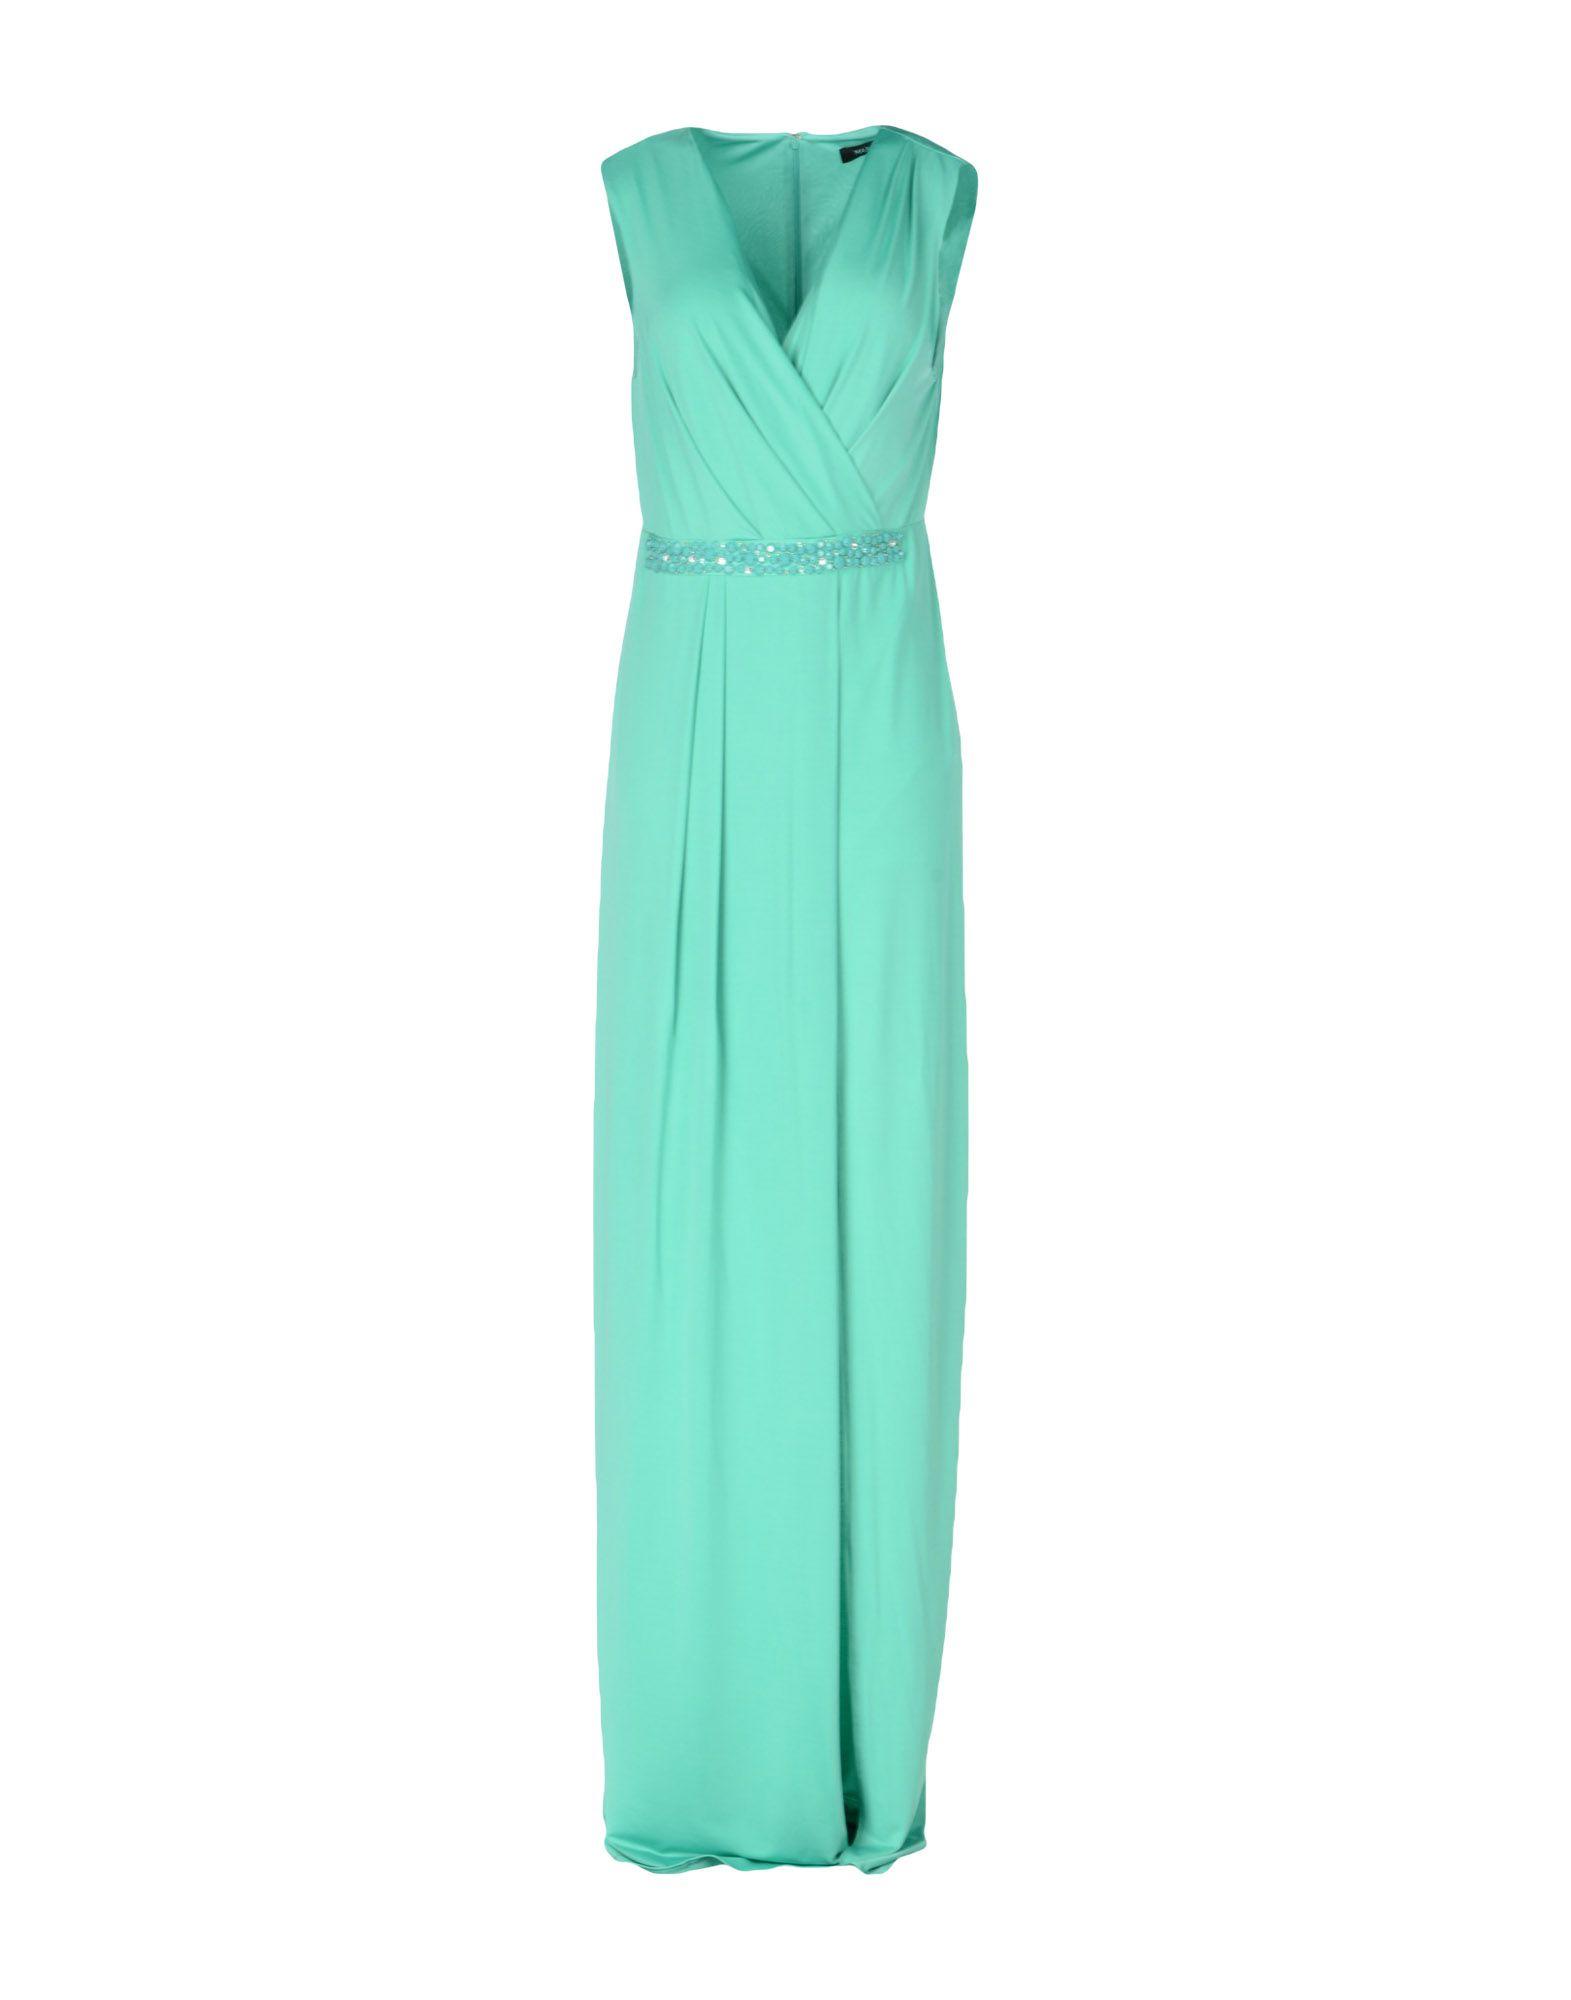 GUESS BY MARCIANO Длинное платье платье marciano guess 74g80k 5355z a996